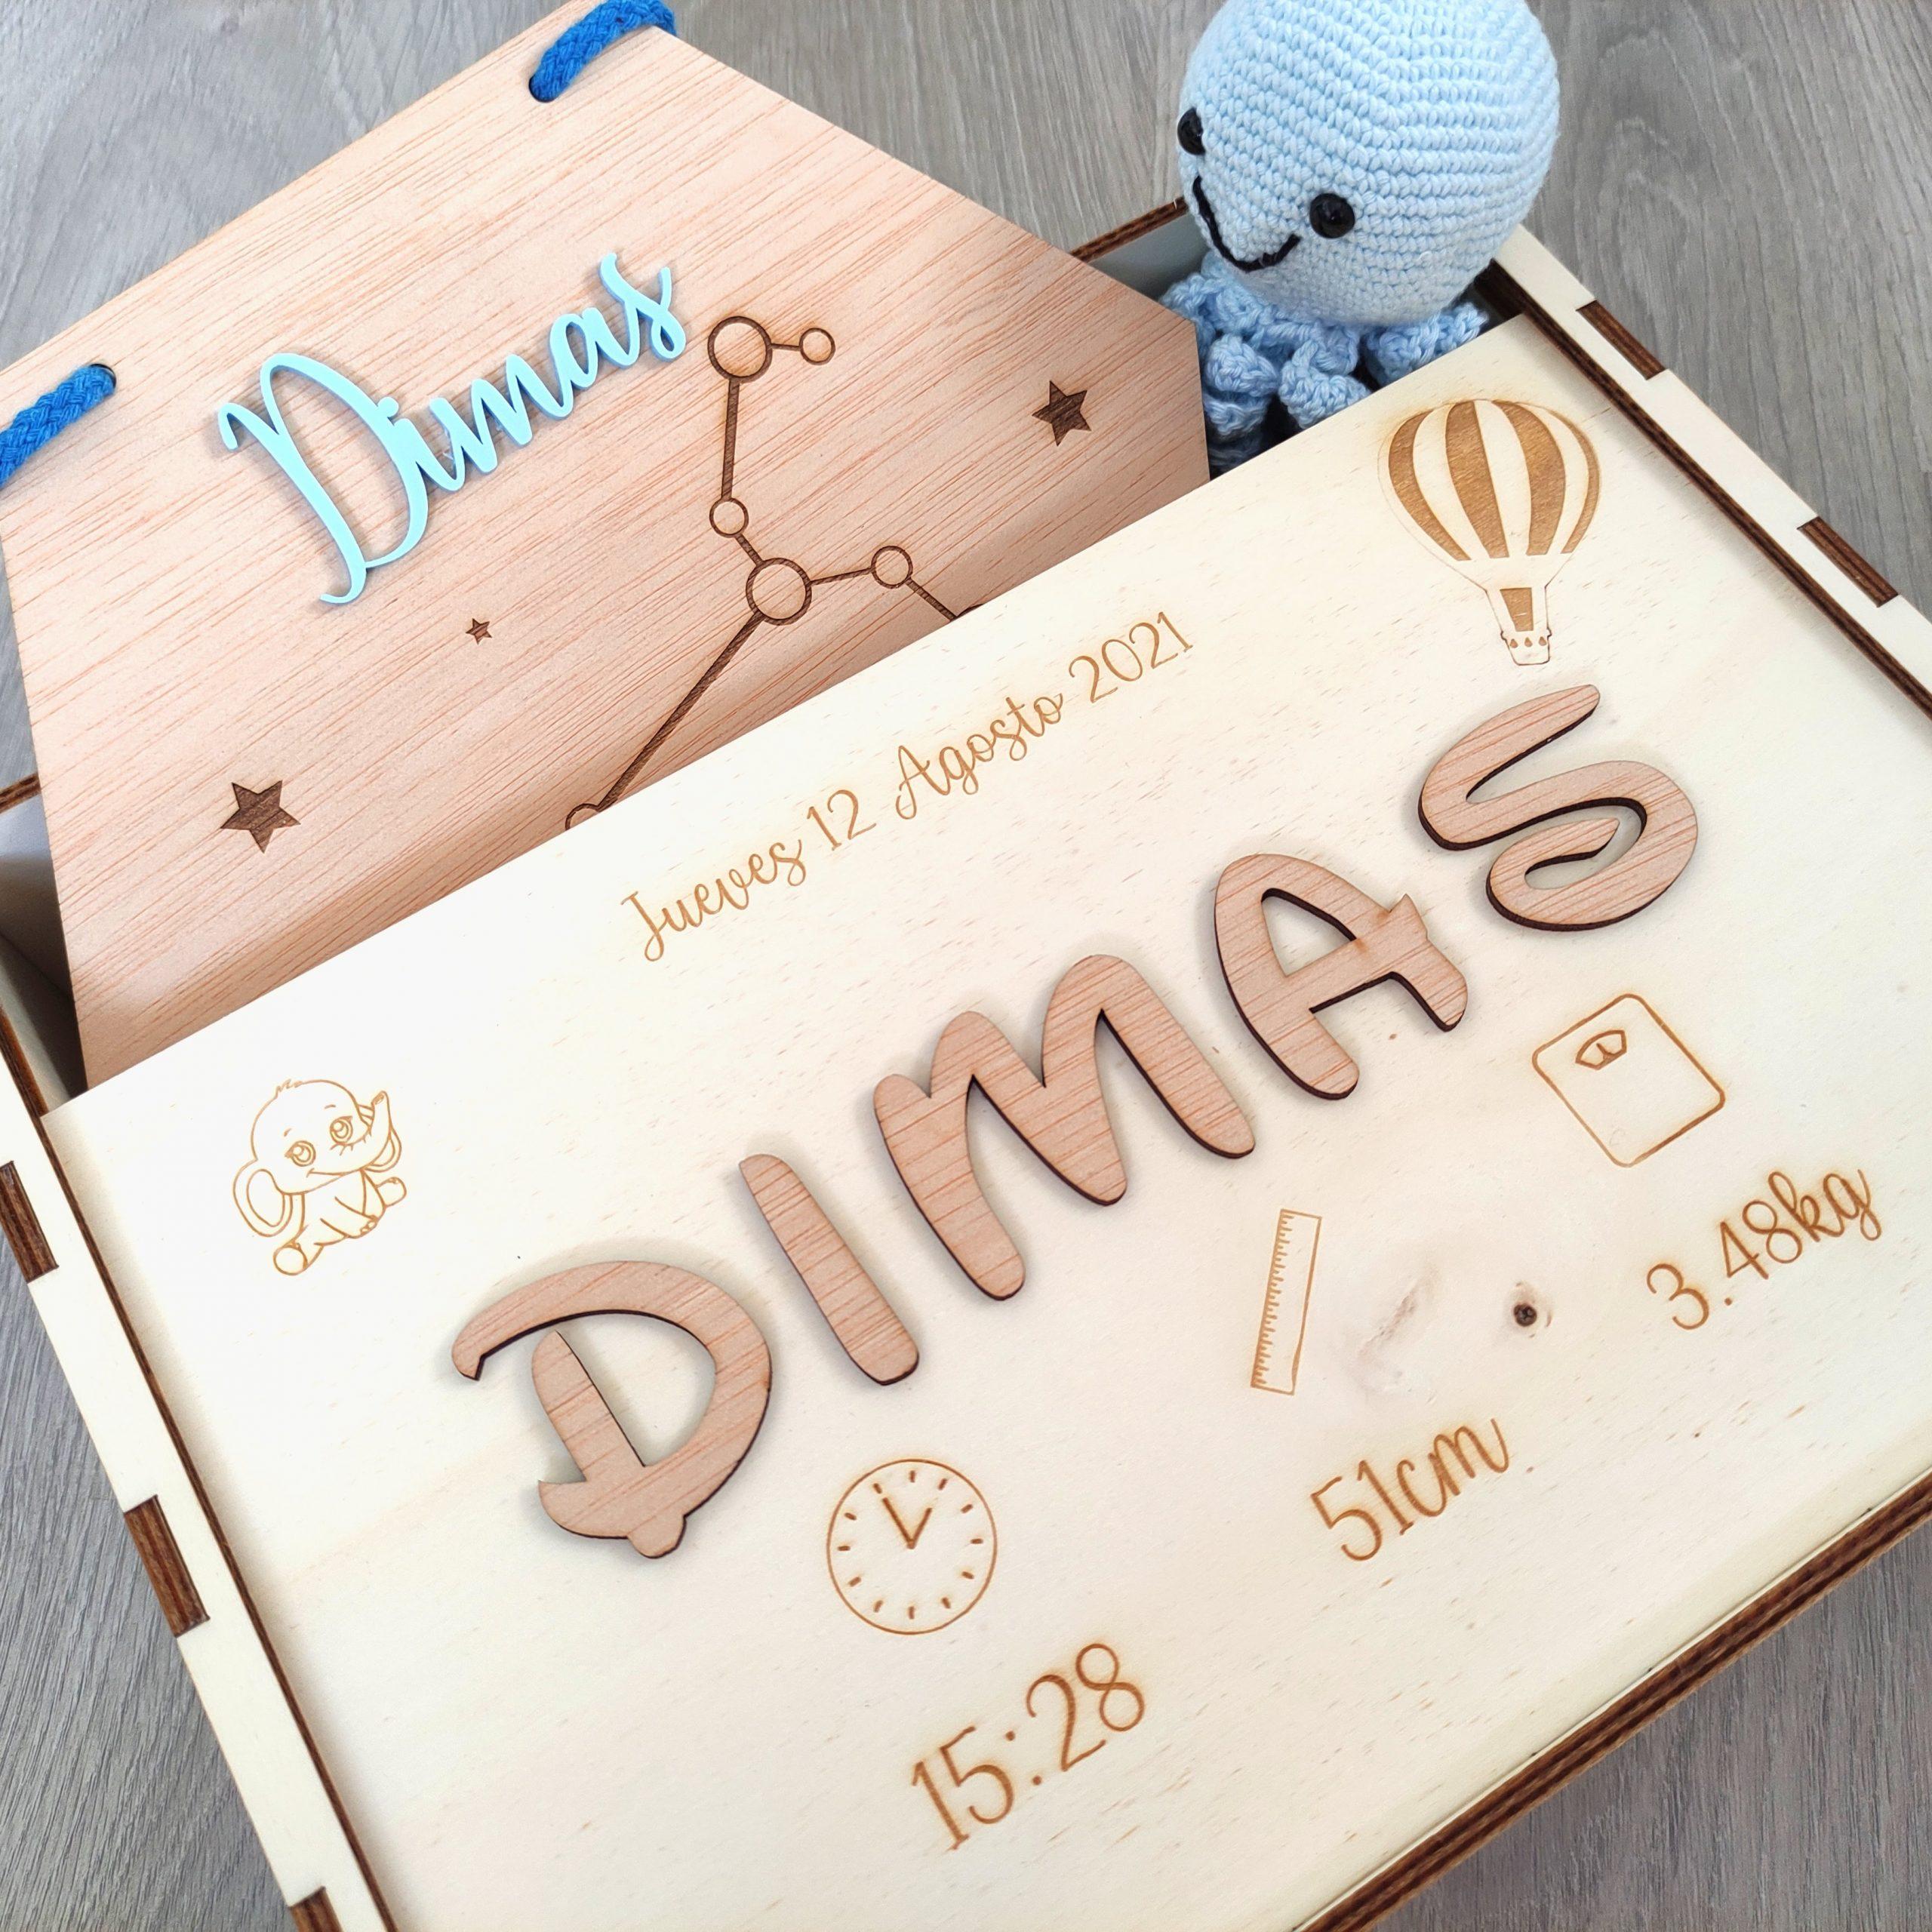 caja artesanal madera personalizada natalicio nombres infantil bebé nacimiento personal present